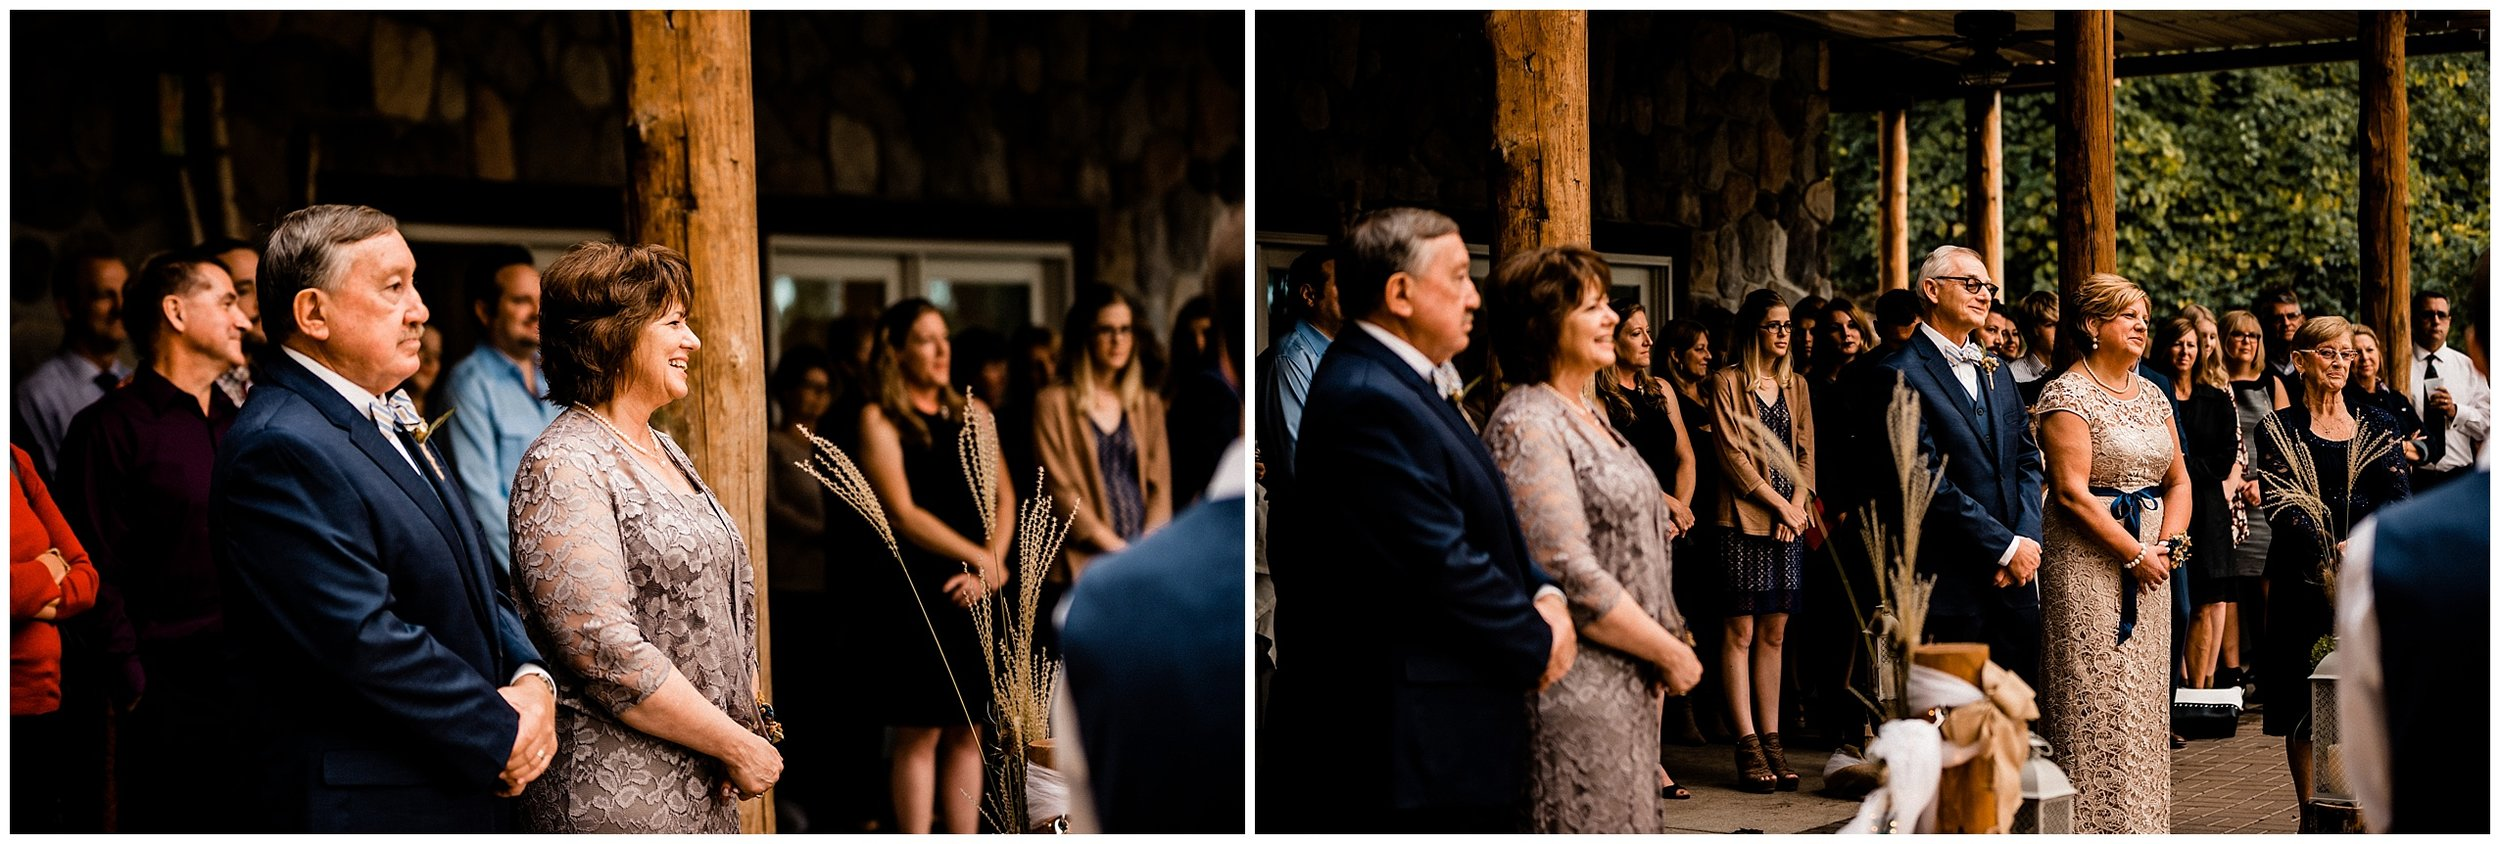 Jerod + Ashley | Just Married #kyleepaigephotography_1805.jpg